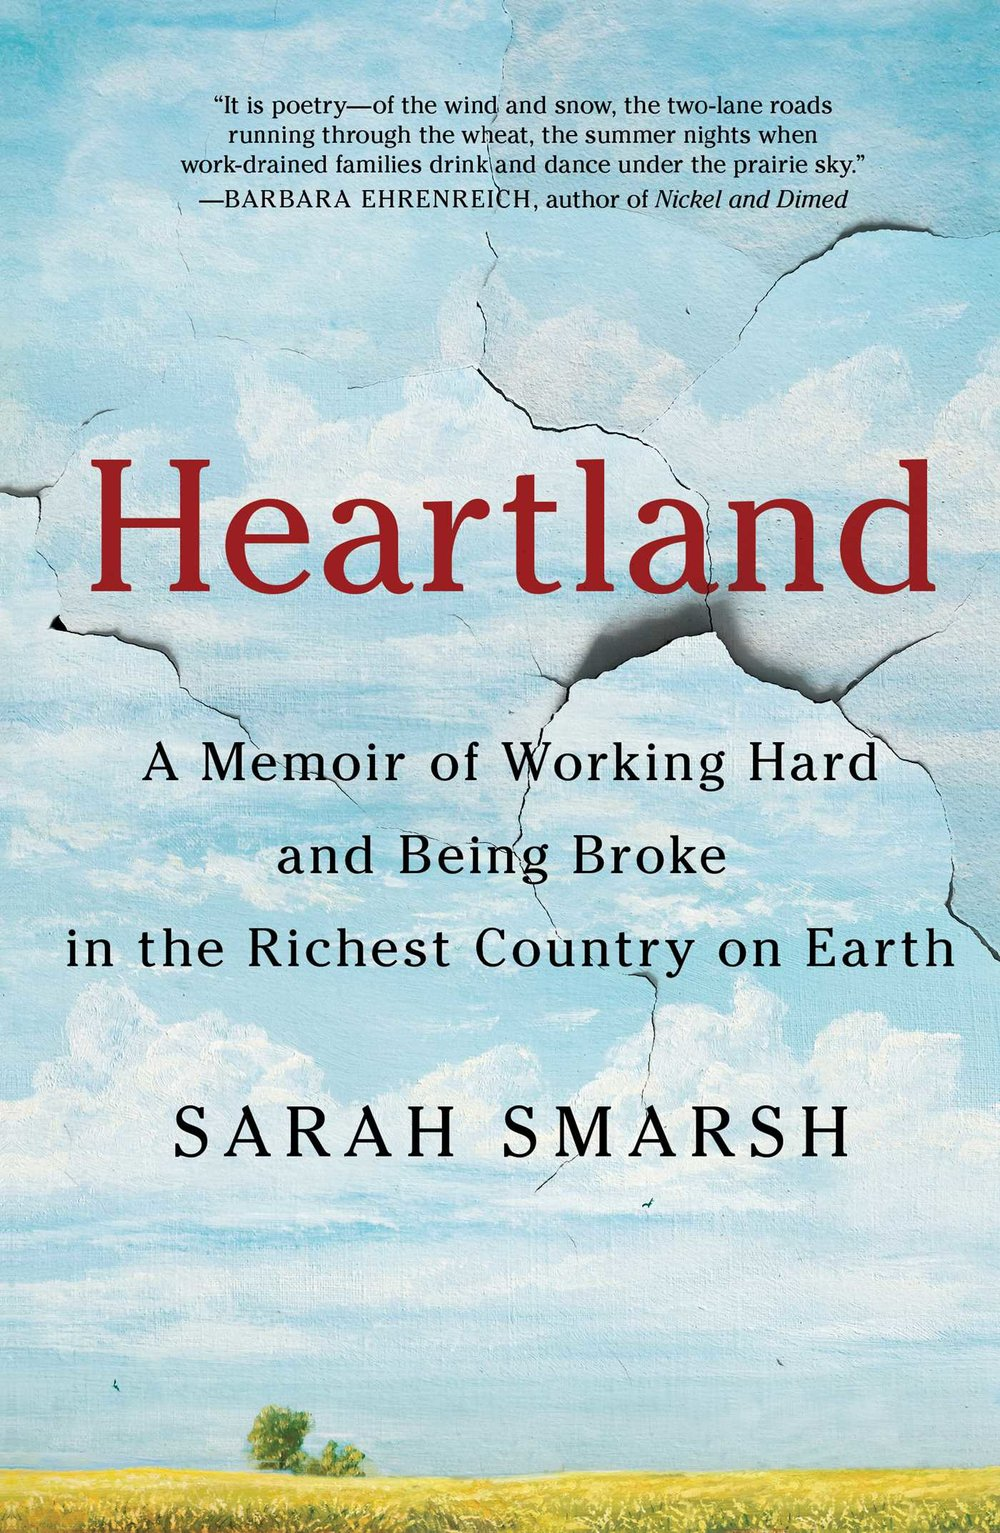 heartland-9781501133091_hr.jpg